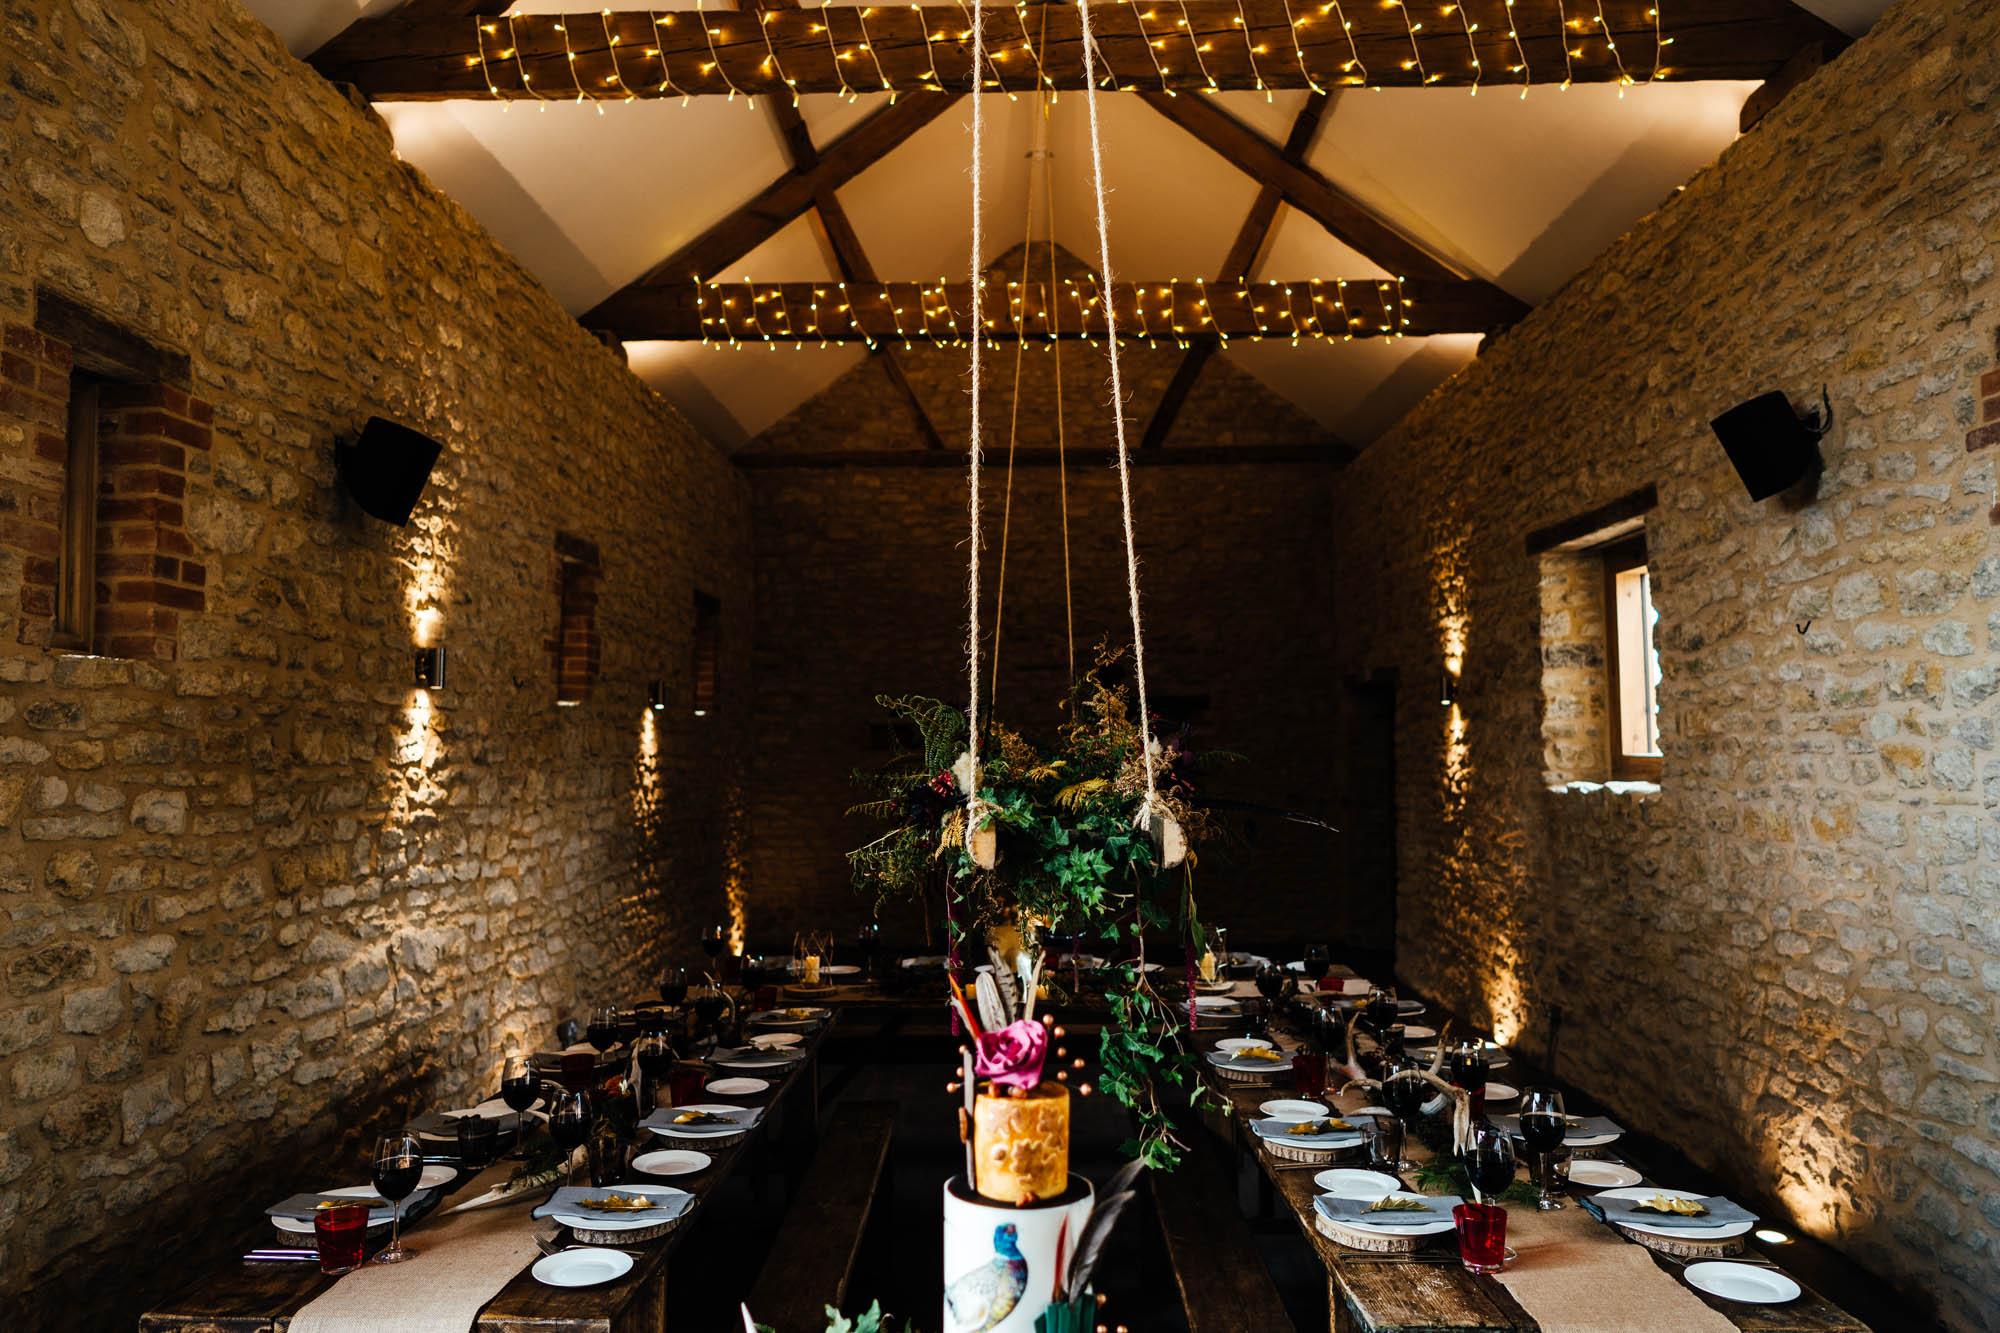 huntsmill-farm-wedding-inspiration-11